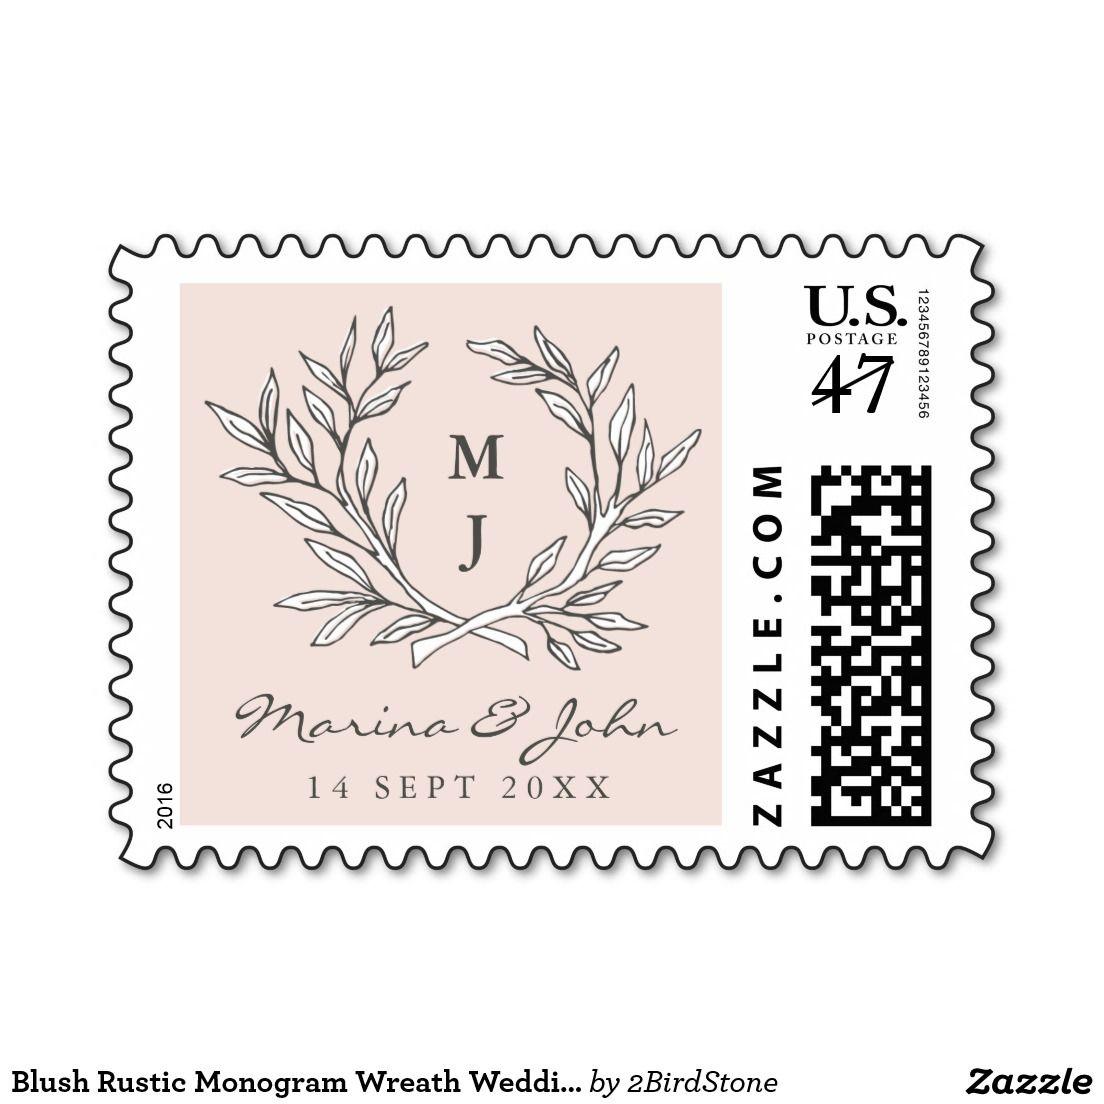 Blush Rustic Monogram Wreath Wedding Postage Stamp   Wedding postage ...